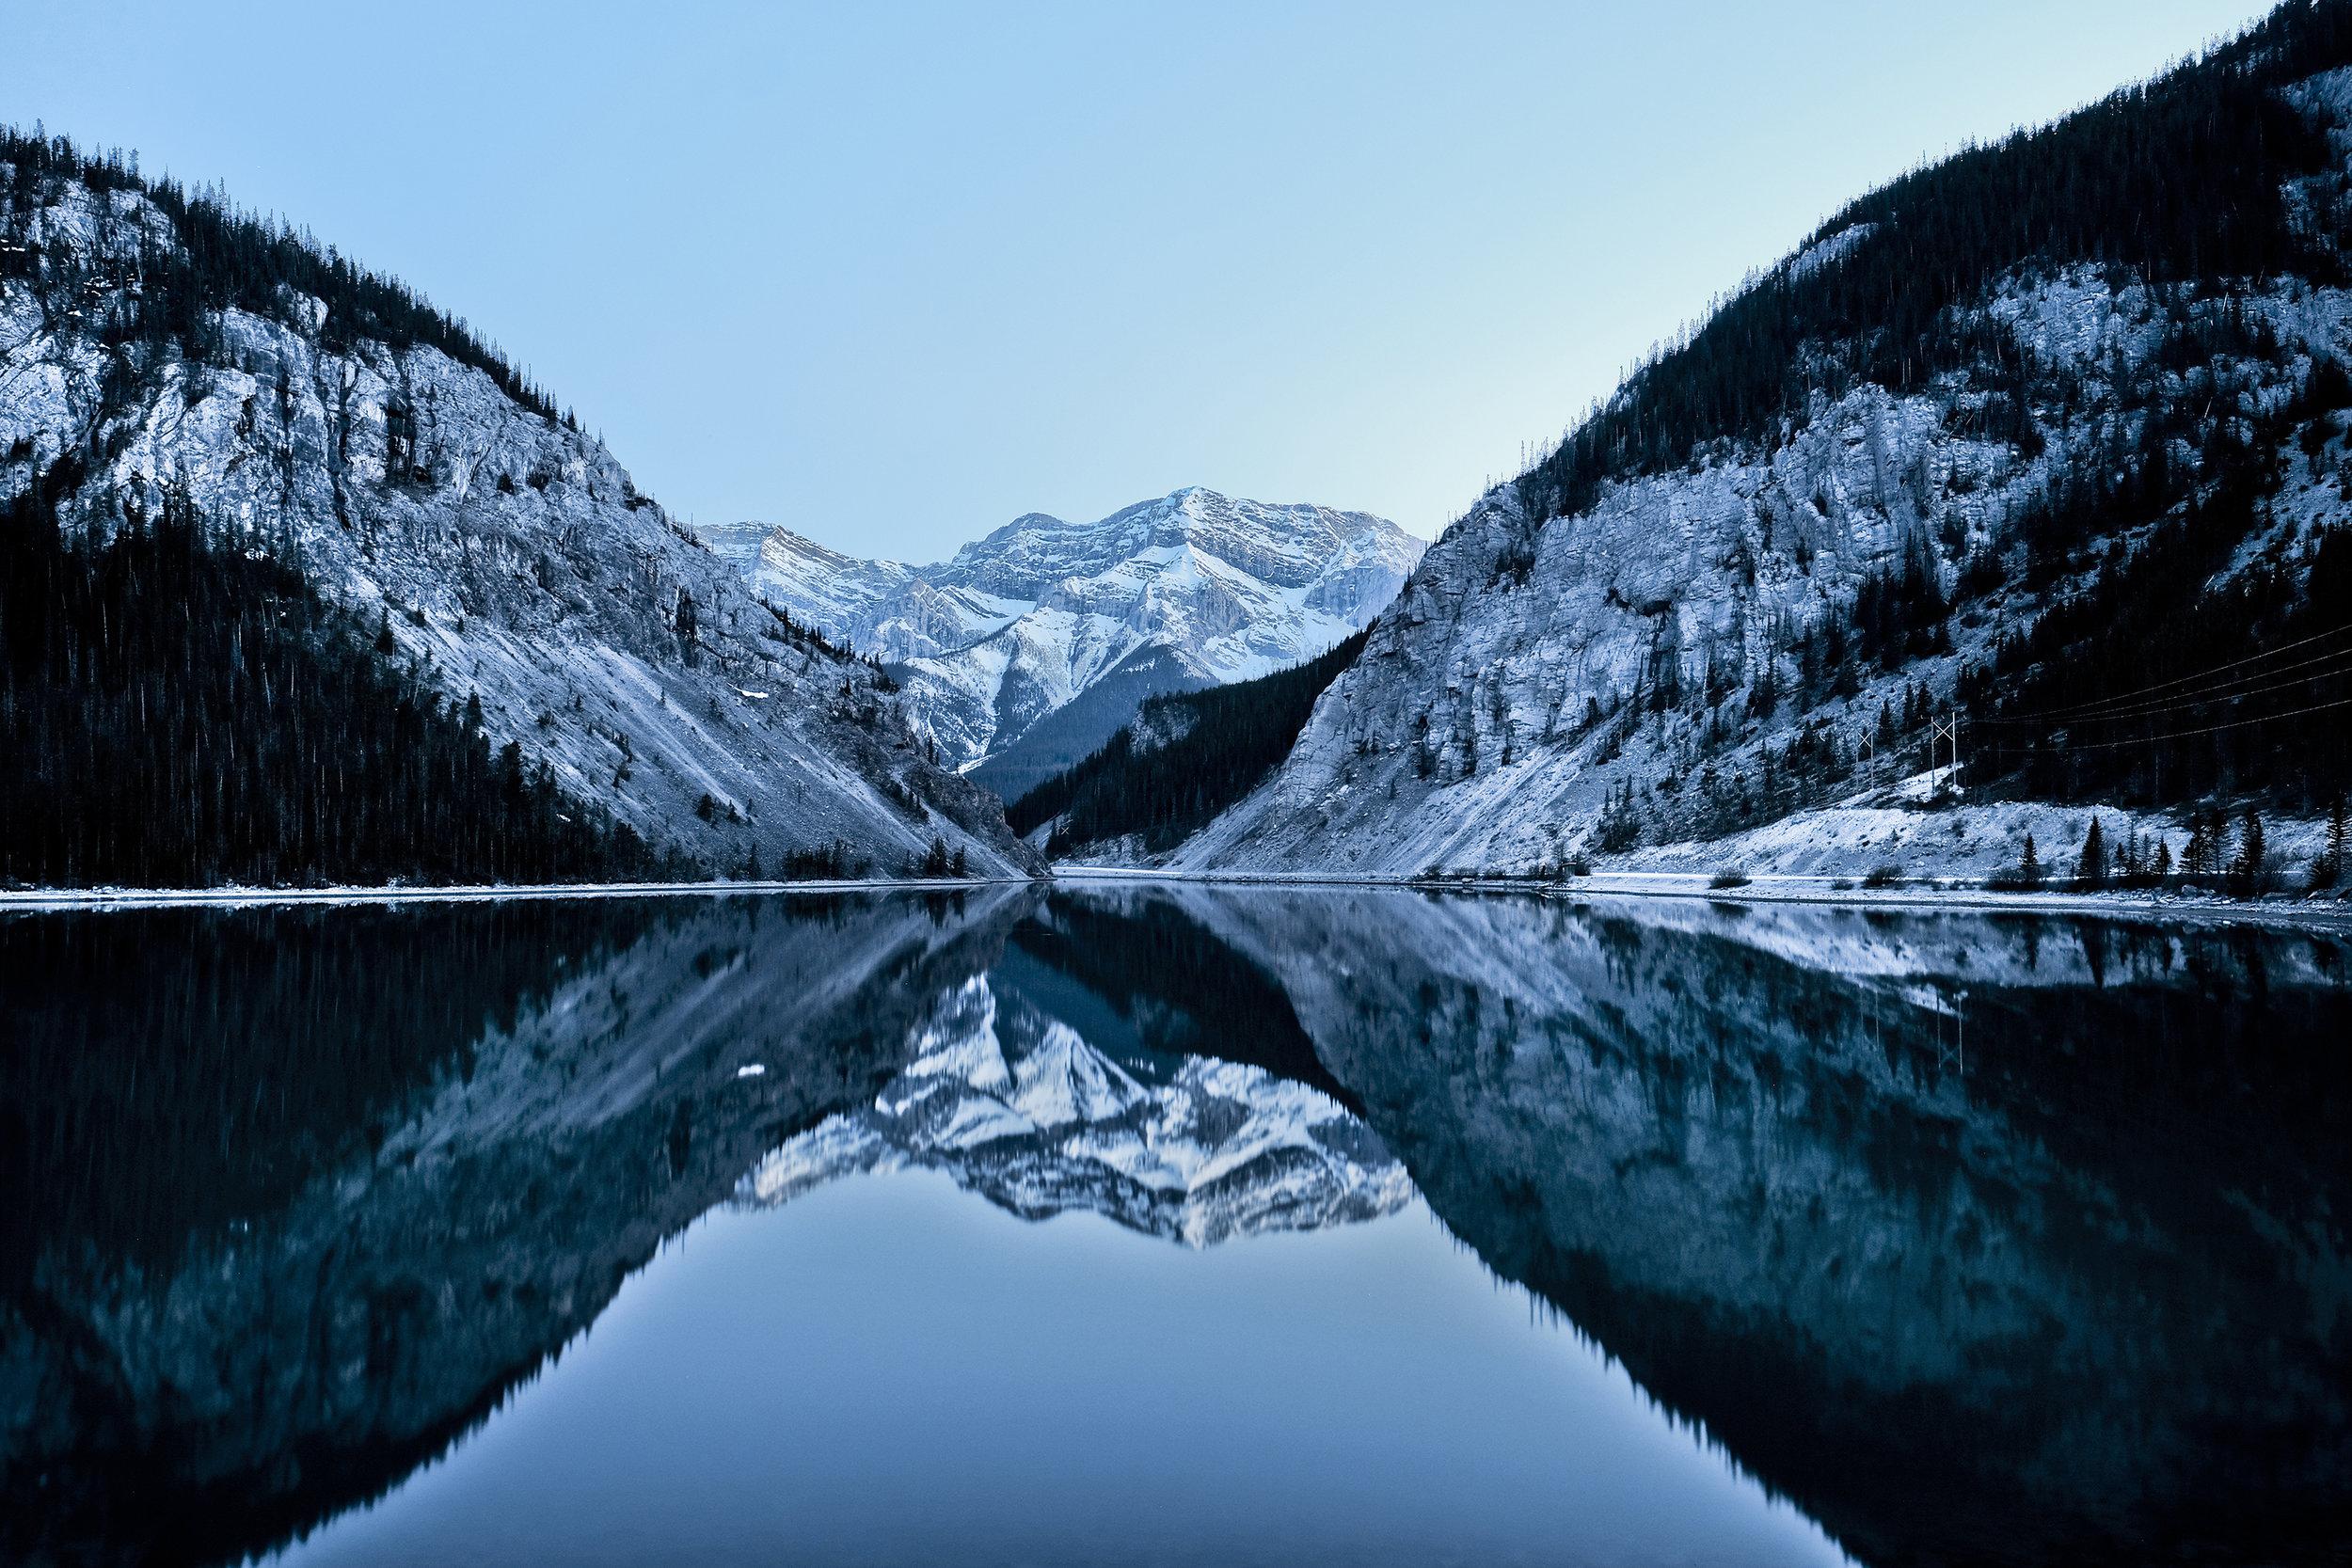 BBP-Banff-243.jpg